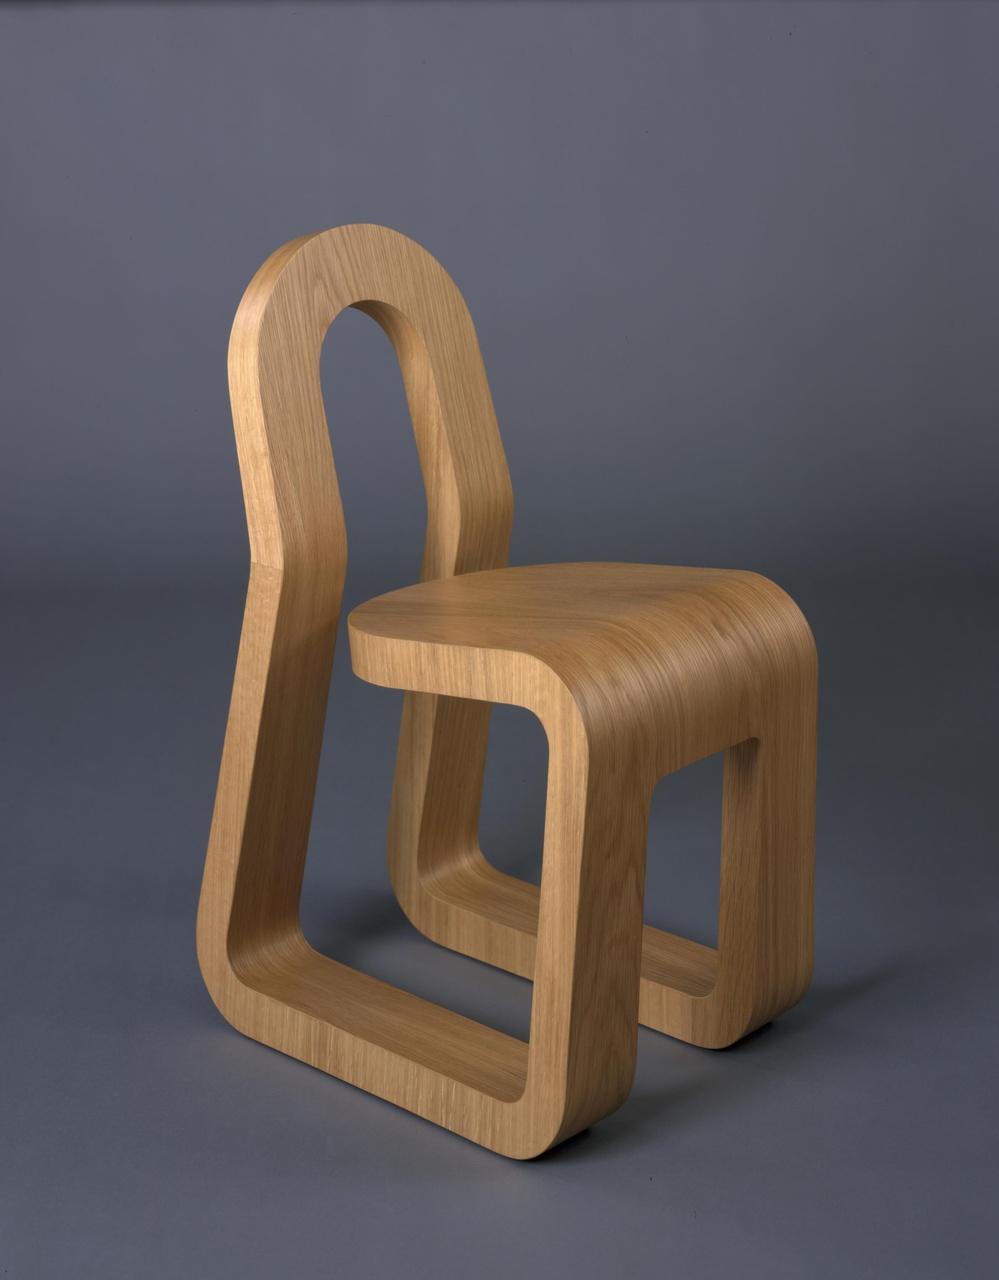 stoel 'Be-chair'